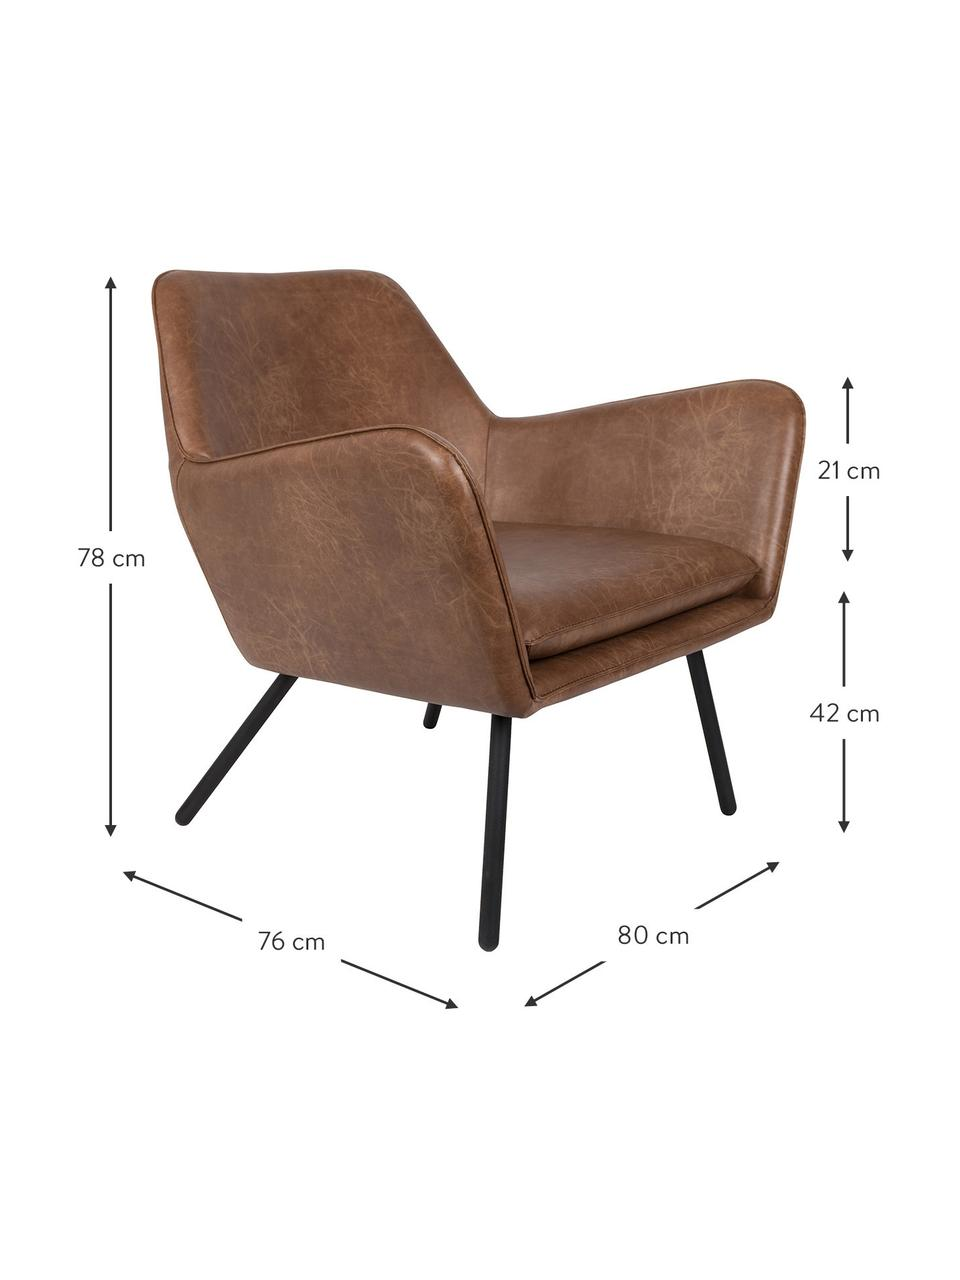 Poltrona in similpelle marrone Bon, Rivestimento: similpelle (64% poliureta, Piedini: metallo verniciato, Similpelle marrone, Larg. 80 x Alt. 76 cm